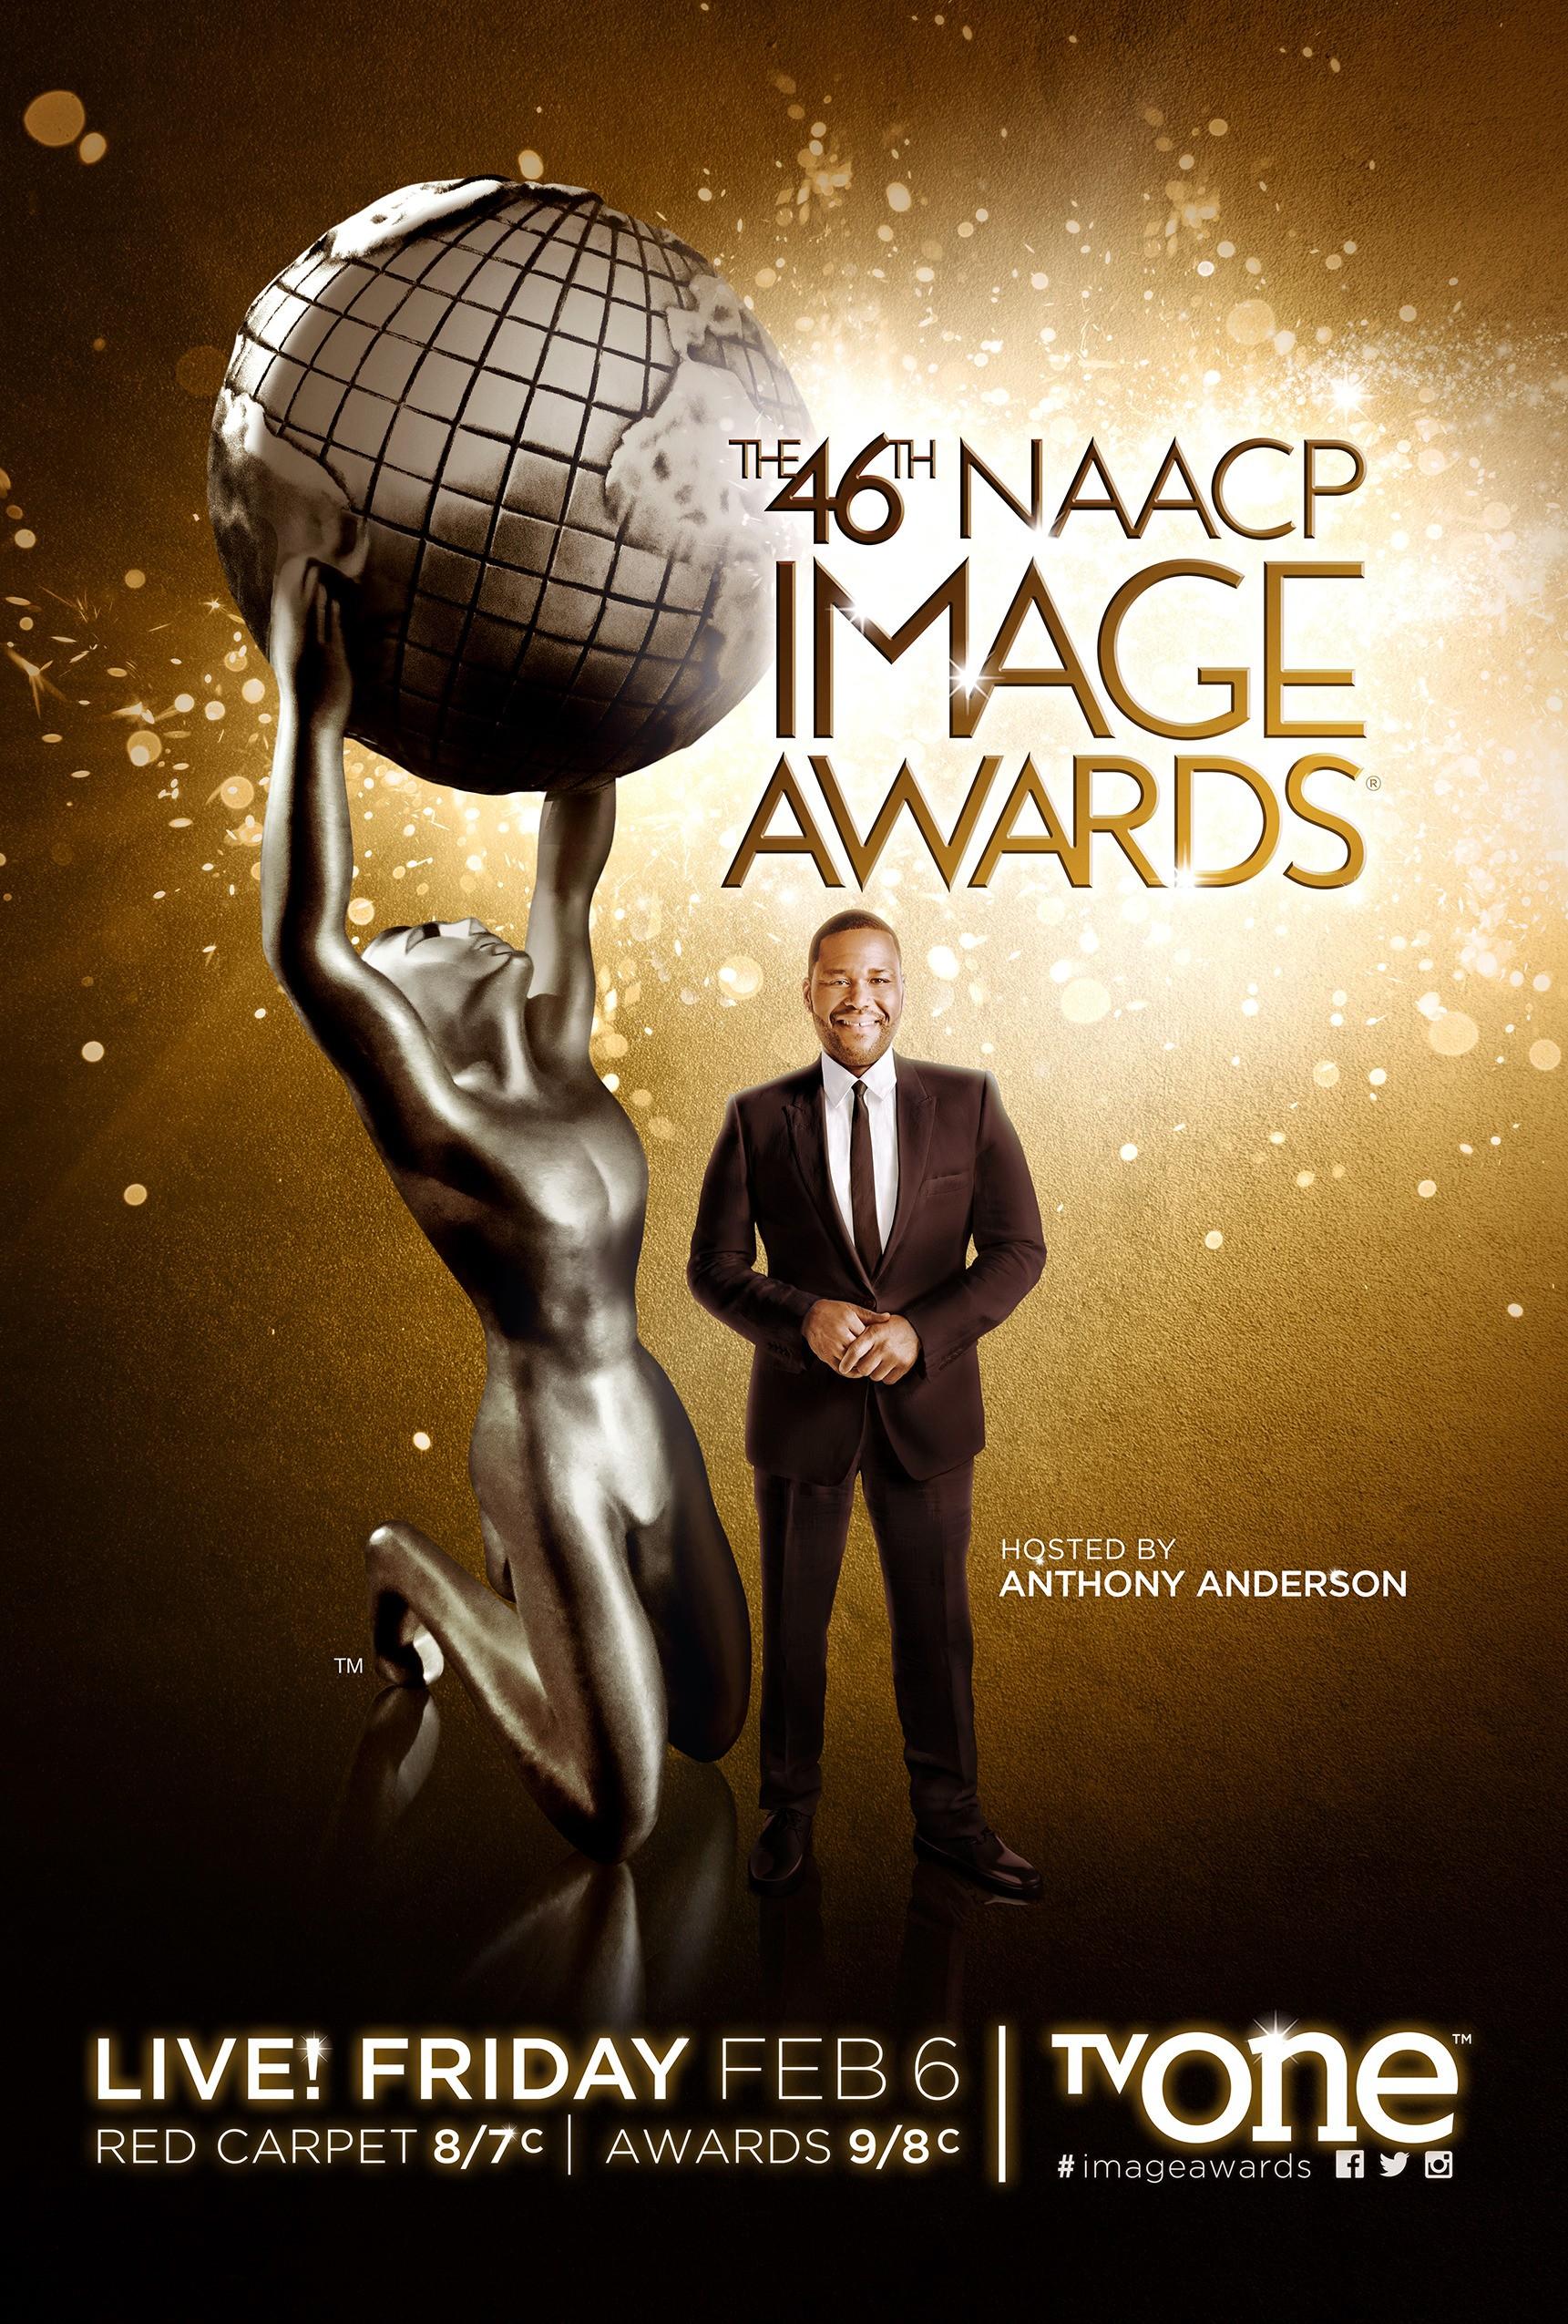 naacp_image_awards_xxlg.jpg